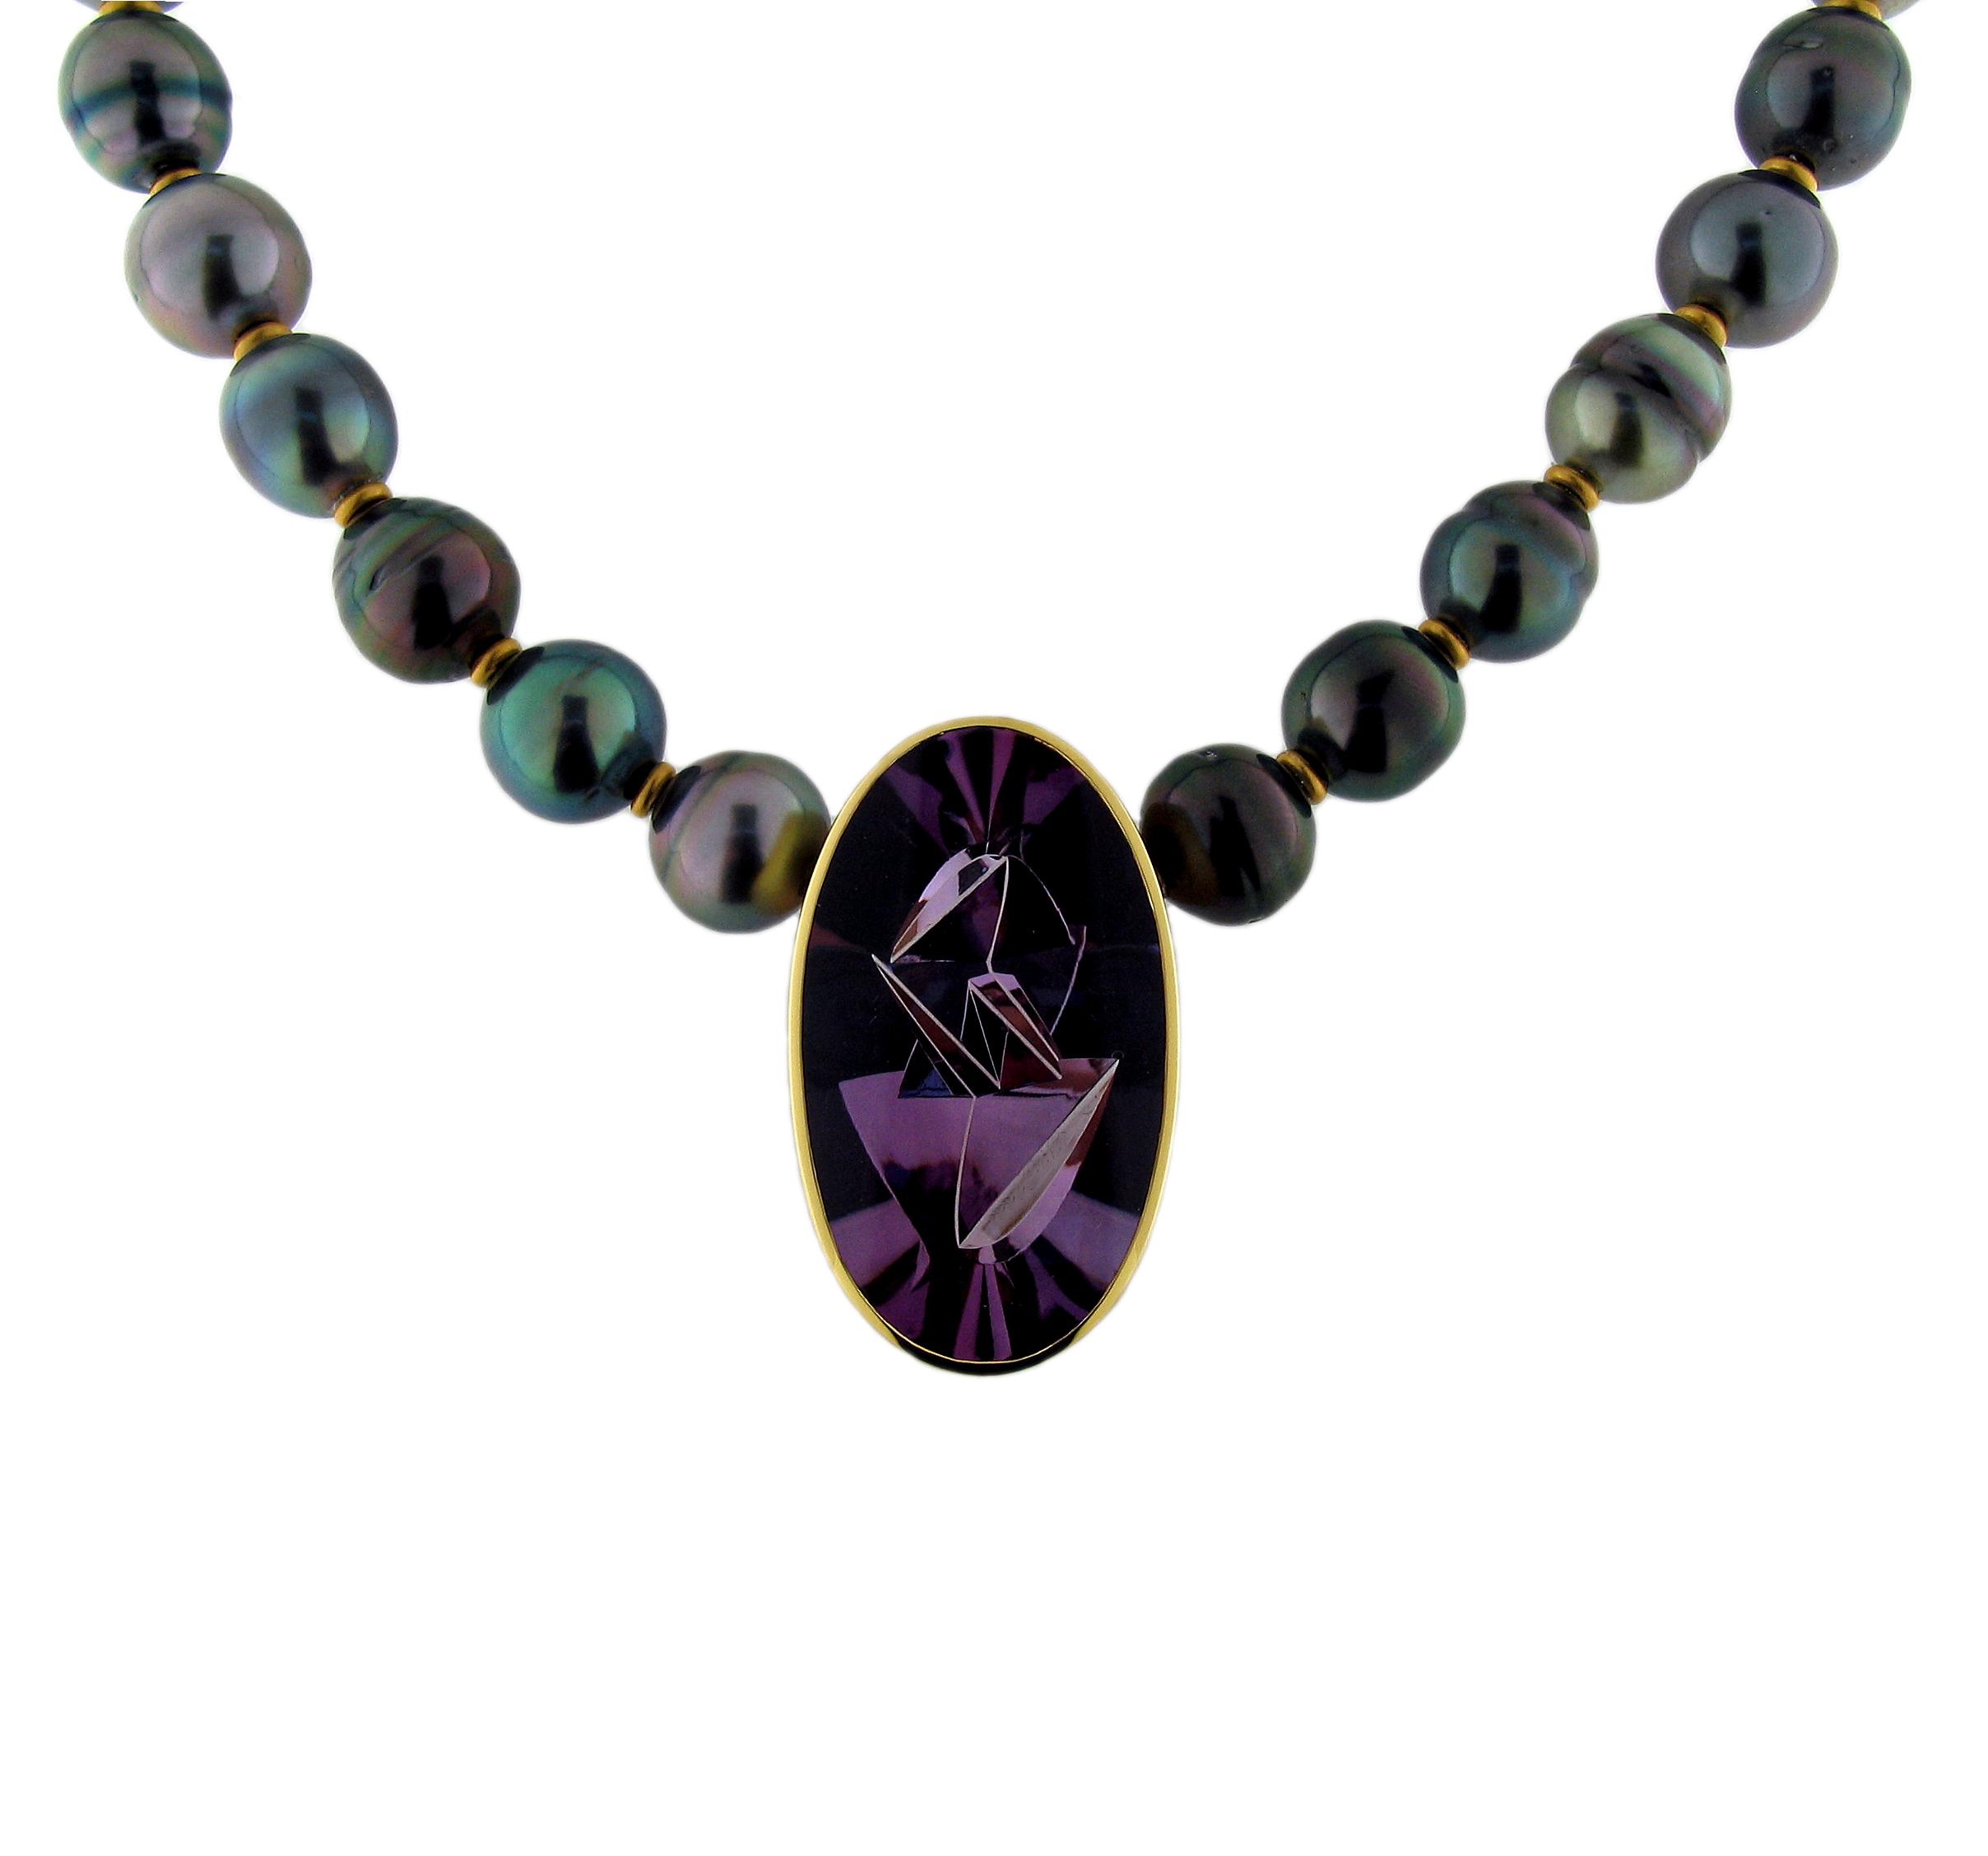 unique-amethyst-munsteiner-pendant-pearl-strand-craft-revival-jewelry-store-grand-rapids